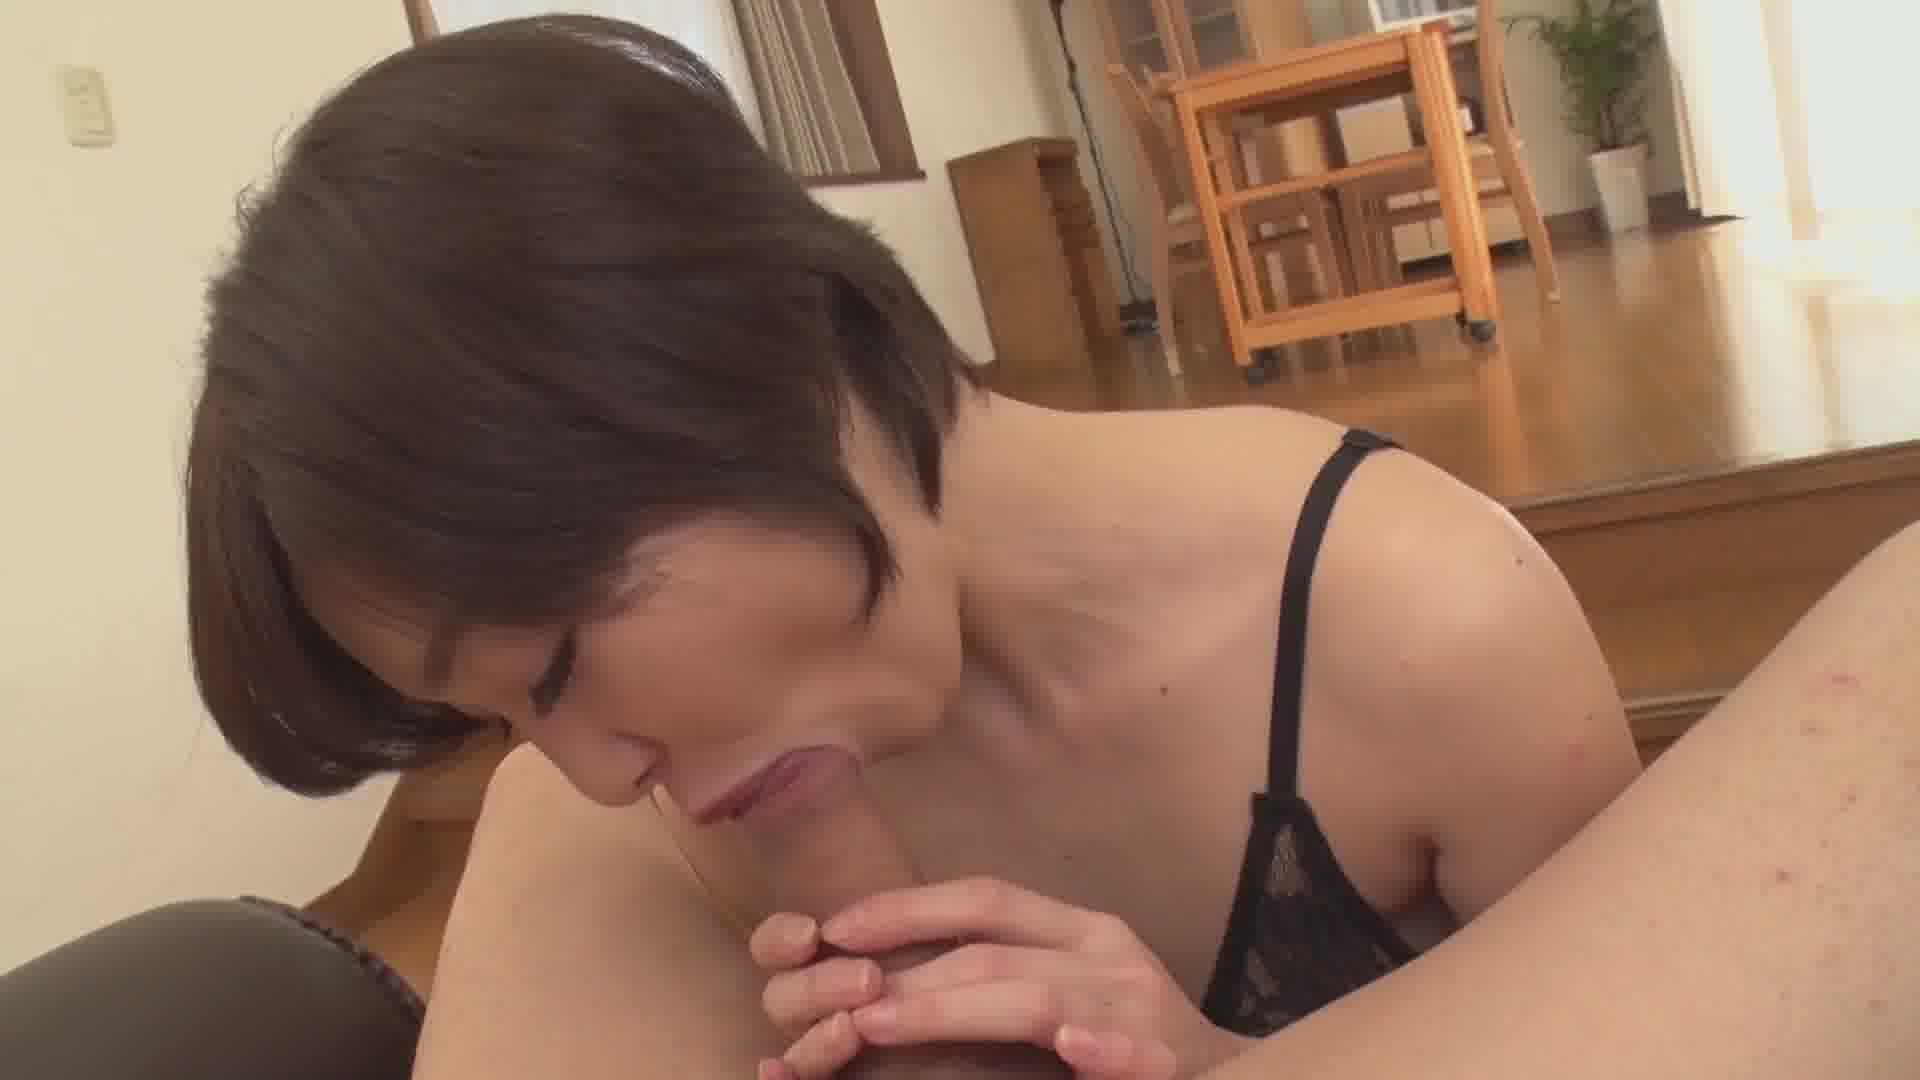 BOGA x BOGA ~江波りゅうが僕のプレイを褒め称えてくれる~ - 江波りゅう【痴女・巨乳・隠語】